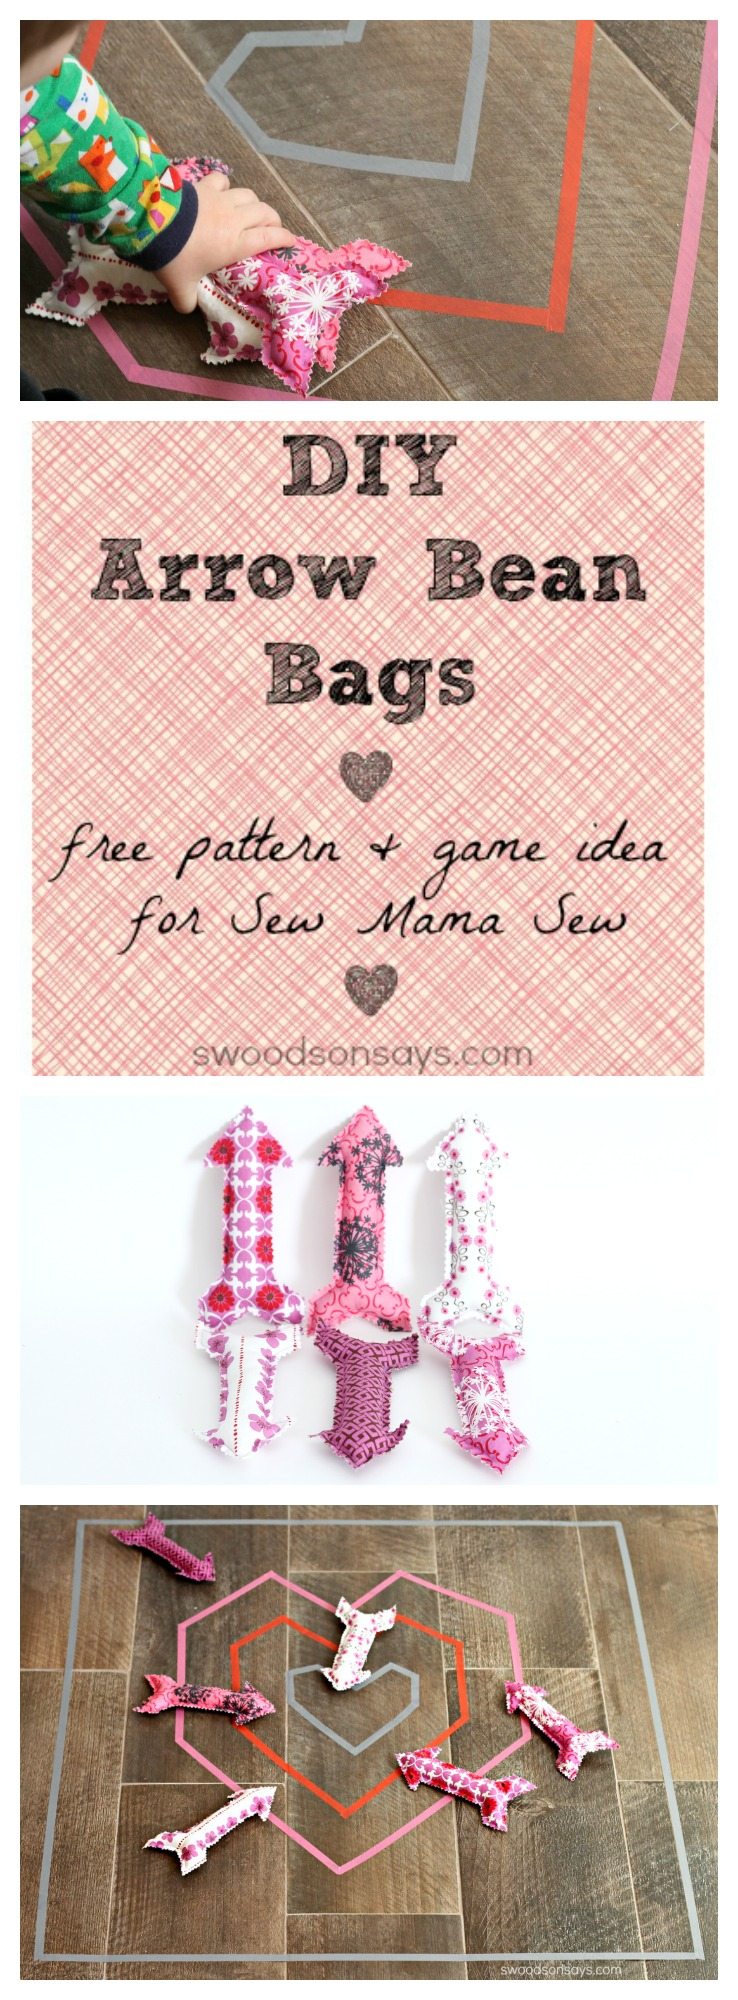 DIY Arrow Bean Bag Free Pattern